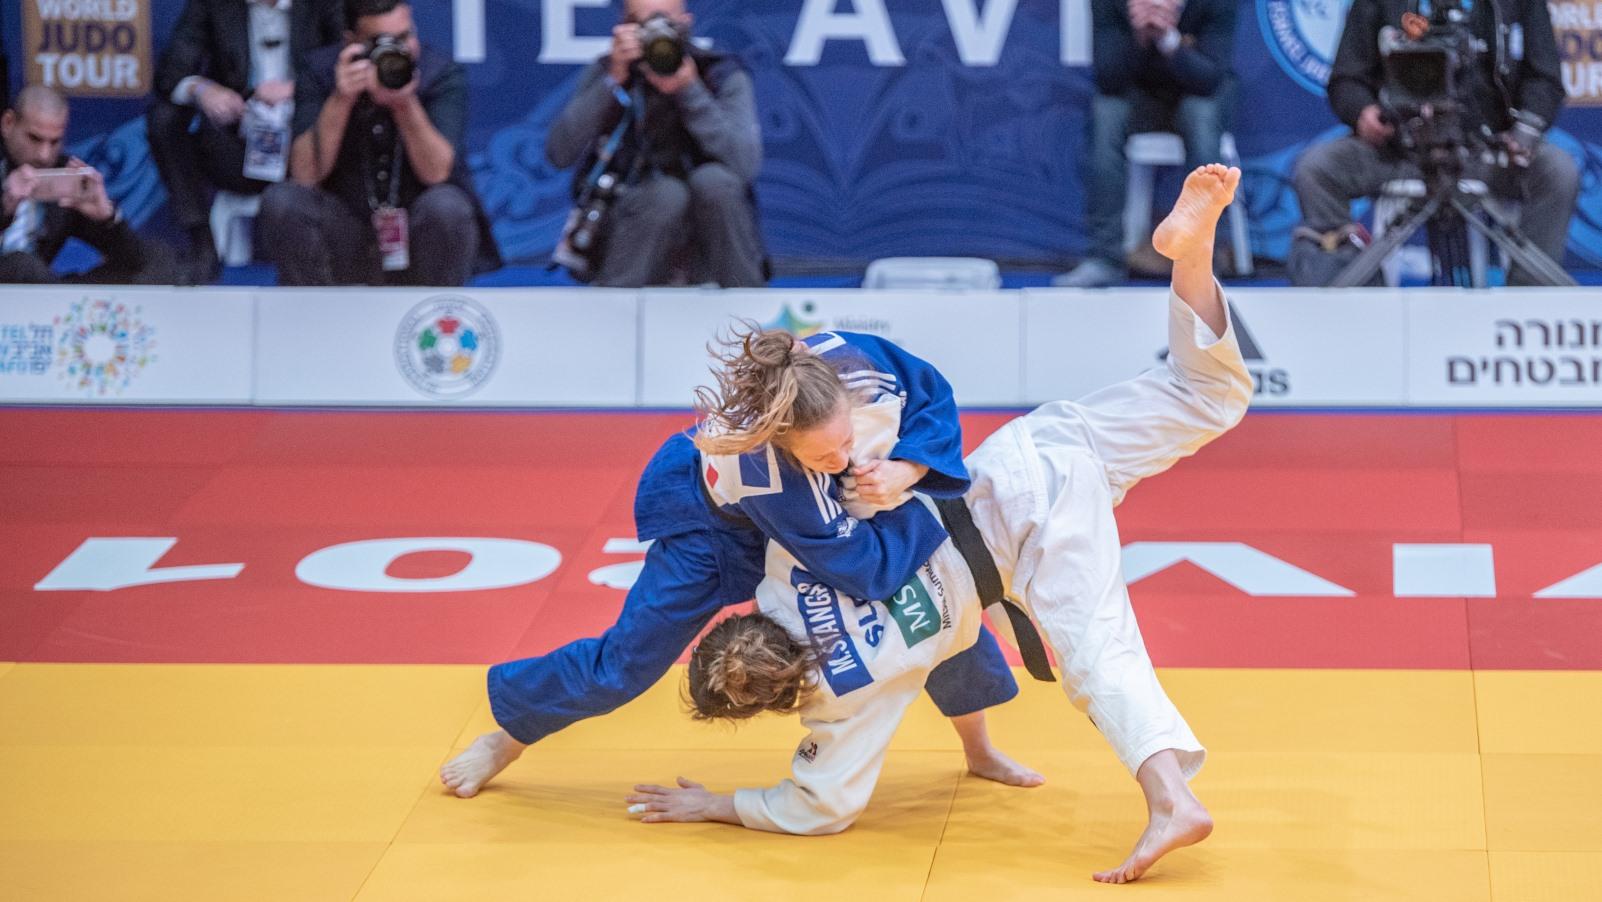 Israel hosts, and wins, international judo grand prix